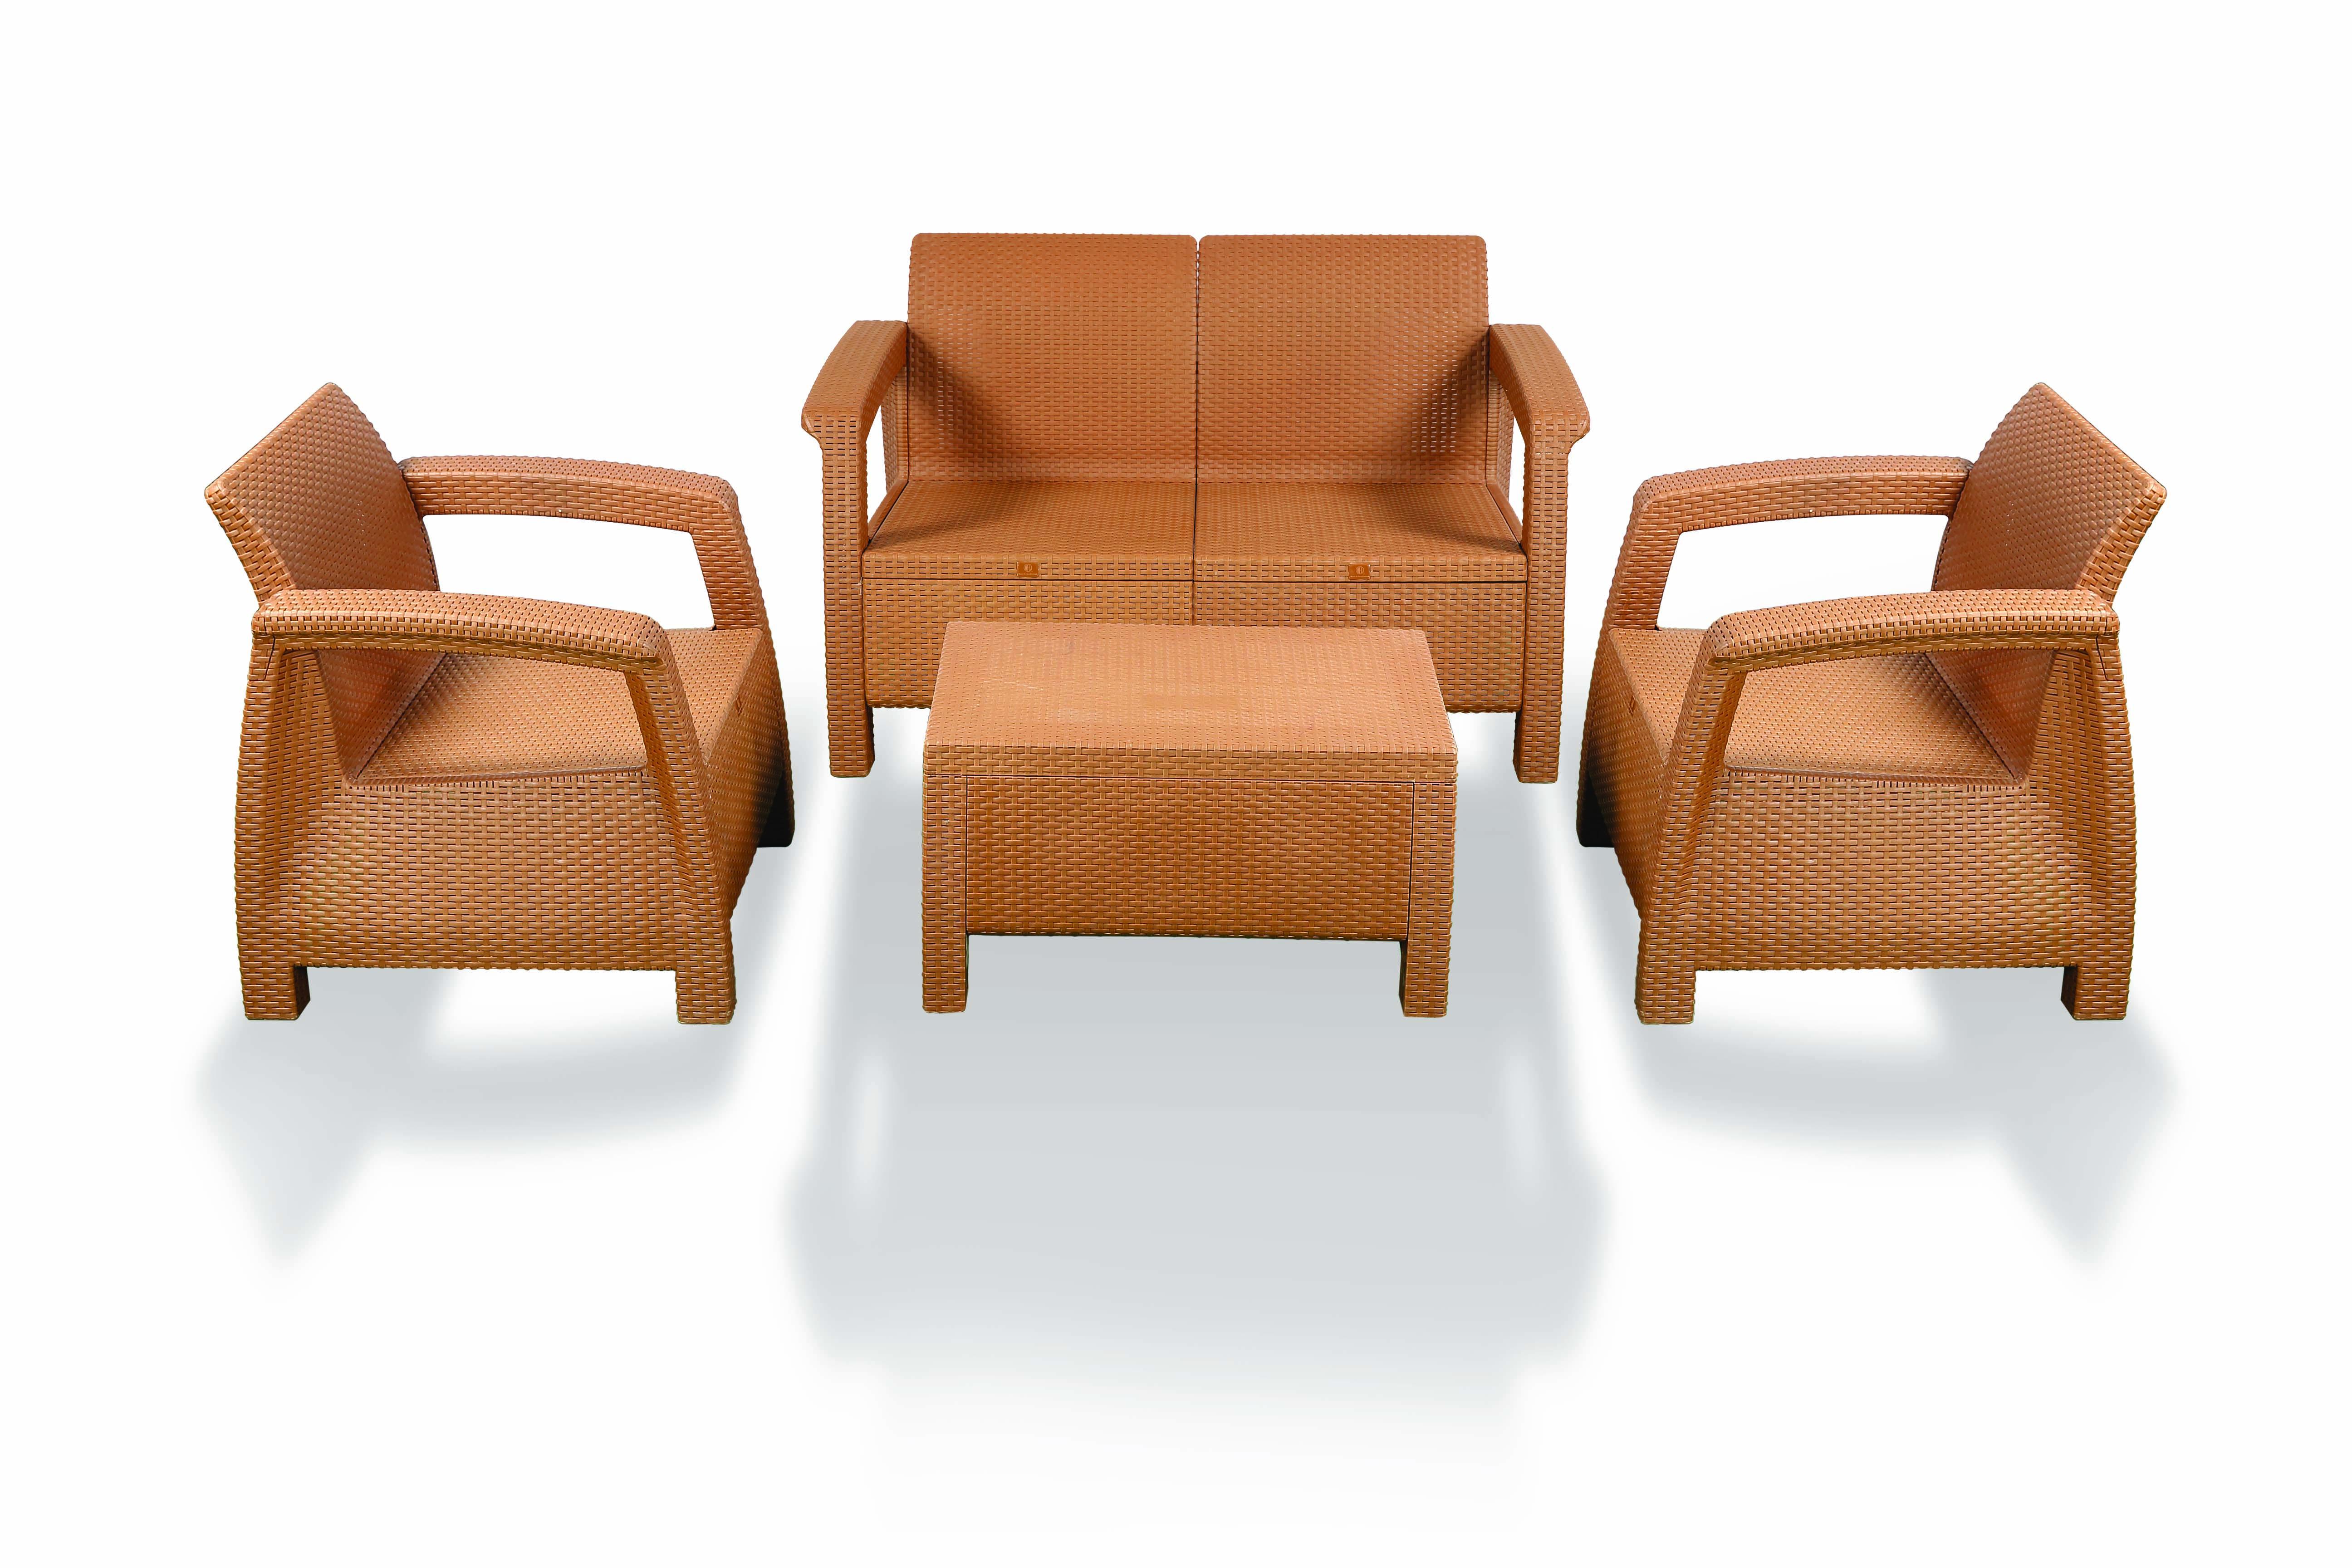 Caino Sofa 4 Pcs Set WO Foam – Eagle Brown